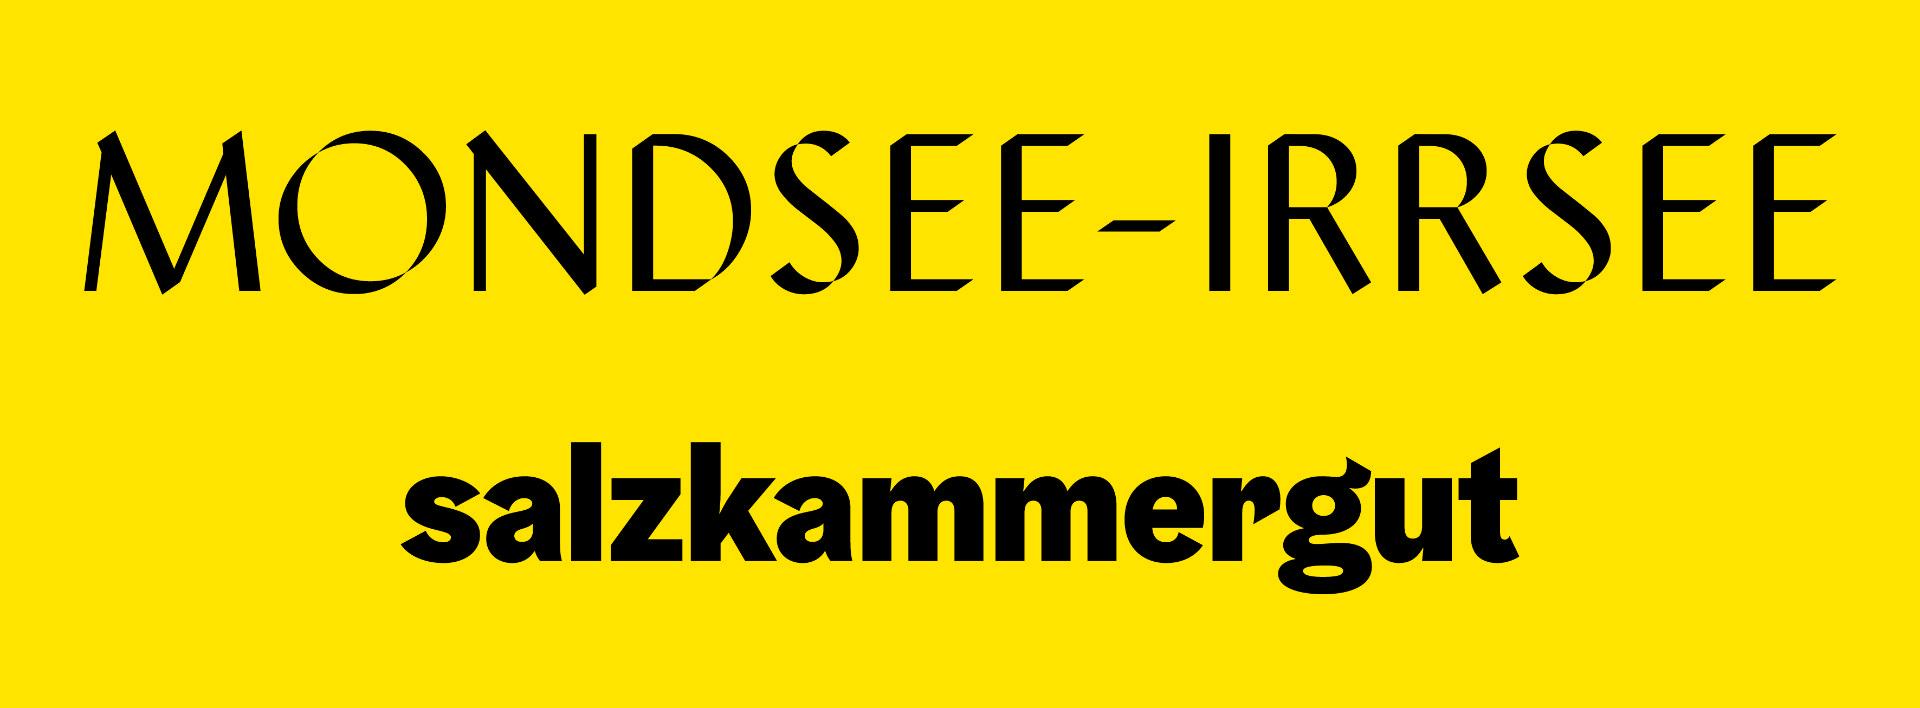 Mondsee Irrsee Logo